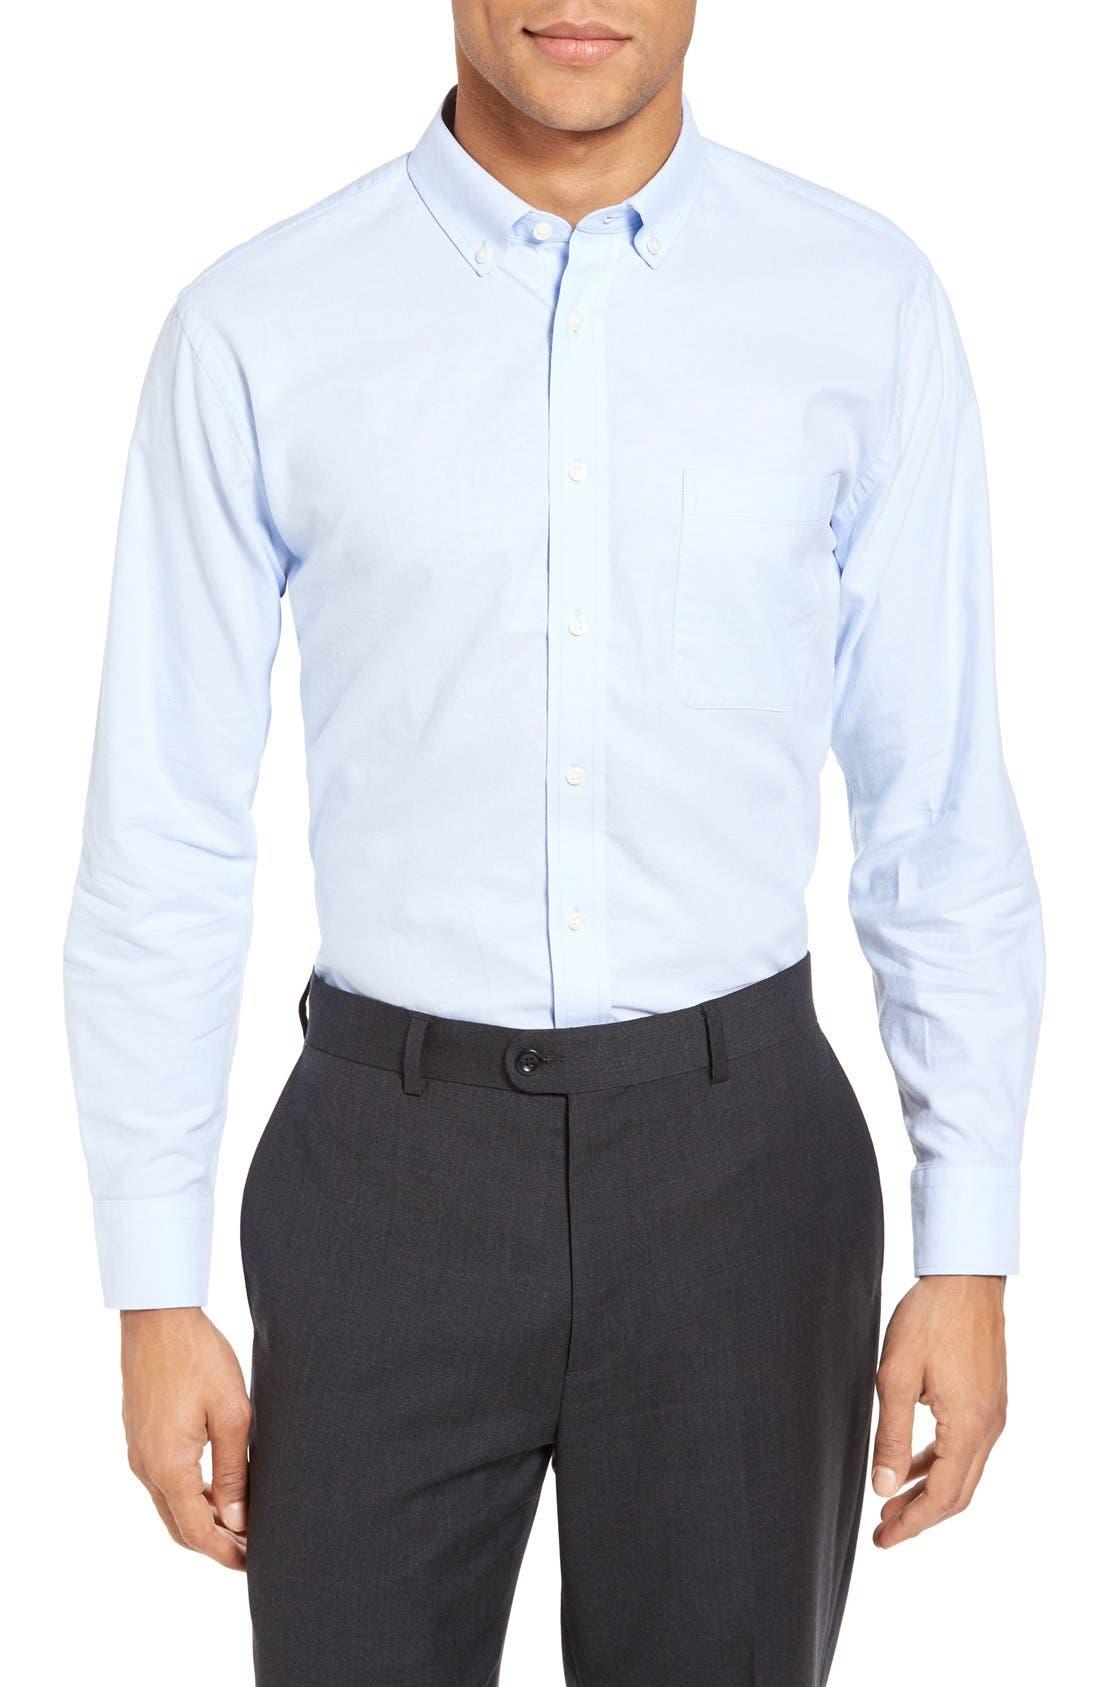 Trim Fit Solid Oxford Dress Shirt,                             Alternate thumbnail 9, color,